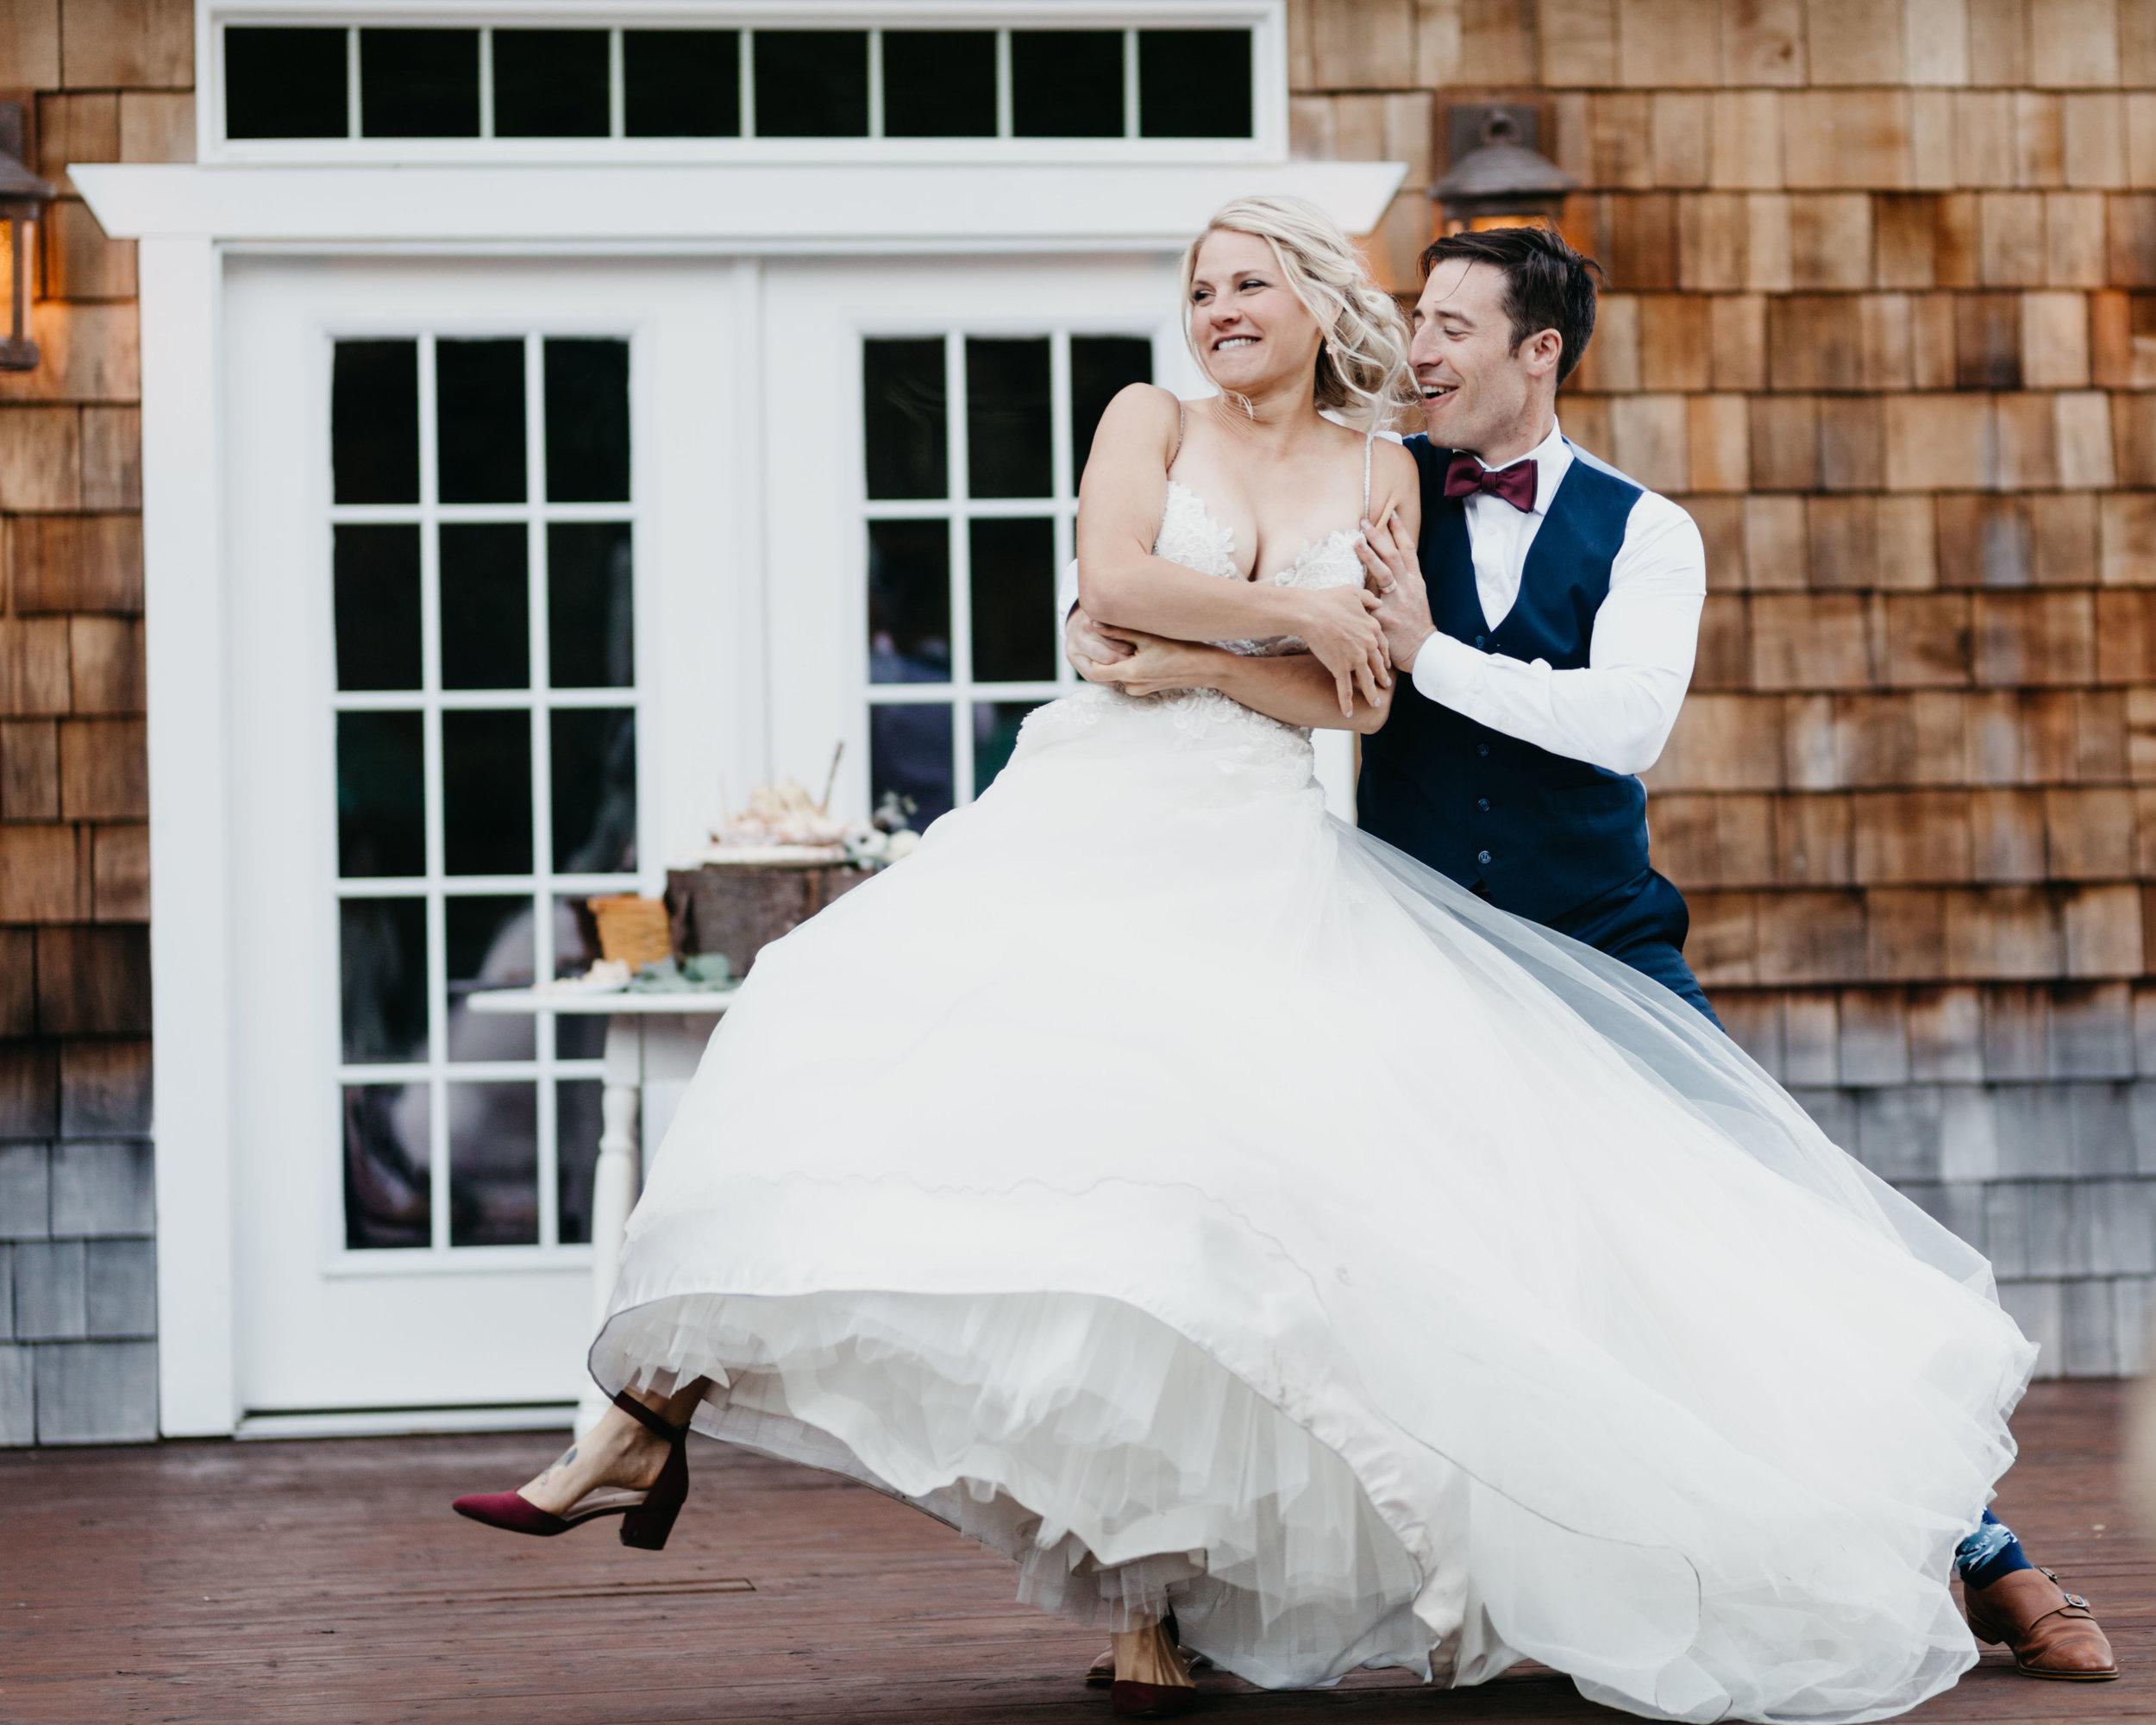 Utah-Wedding-Photographer-124.jpg